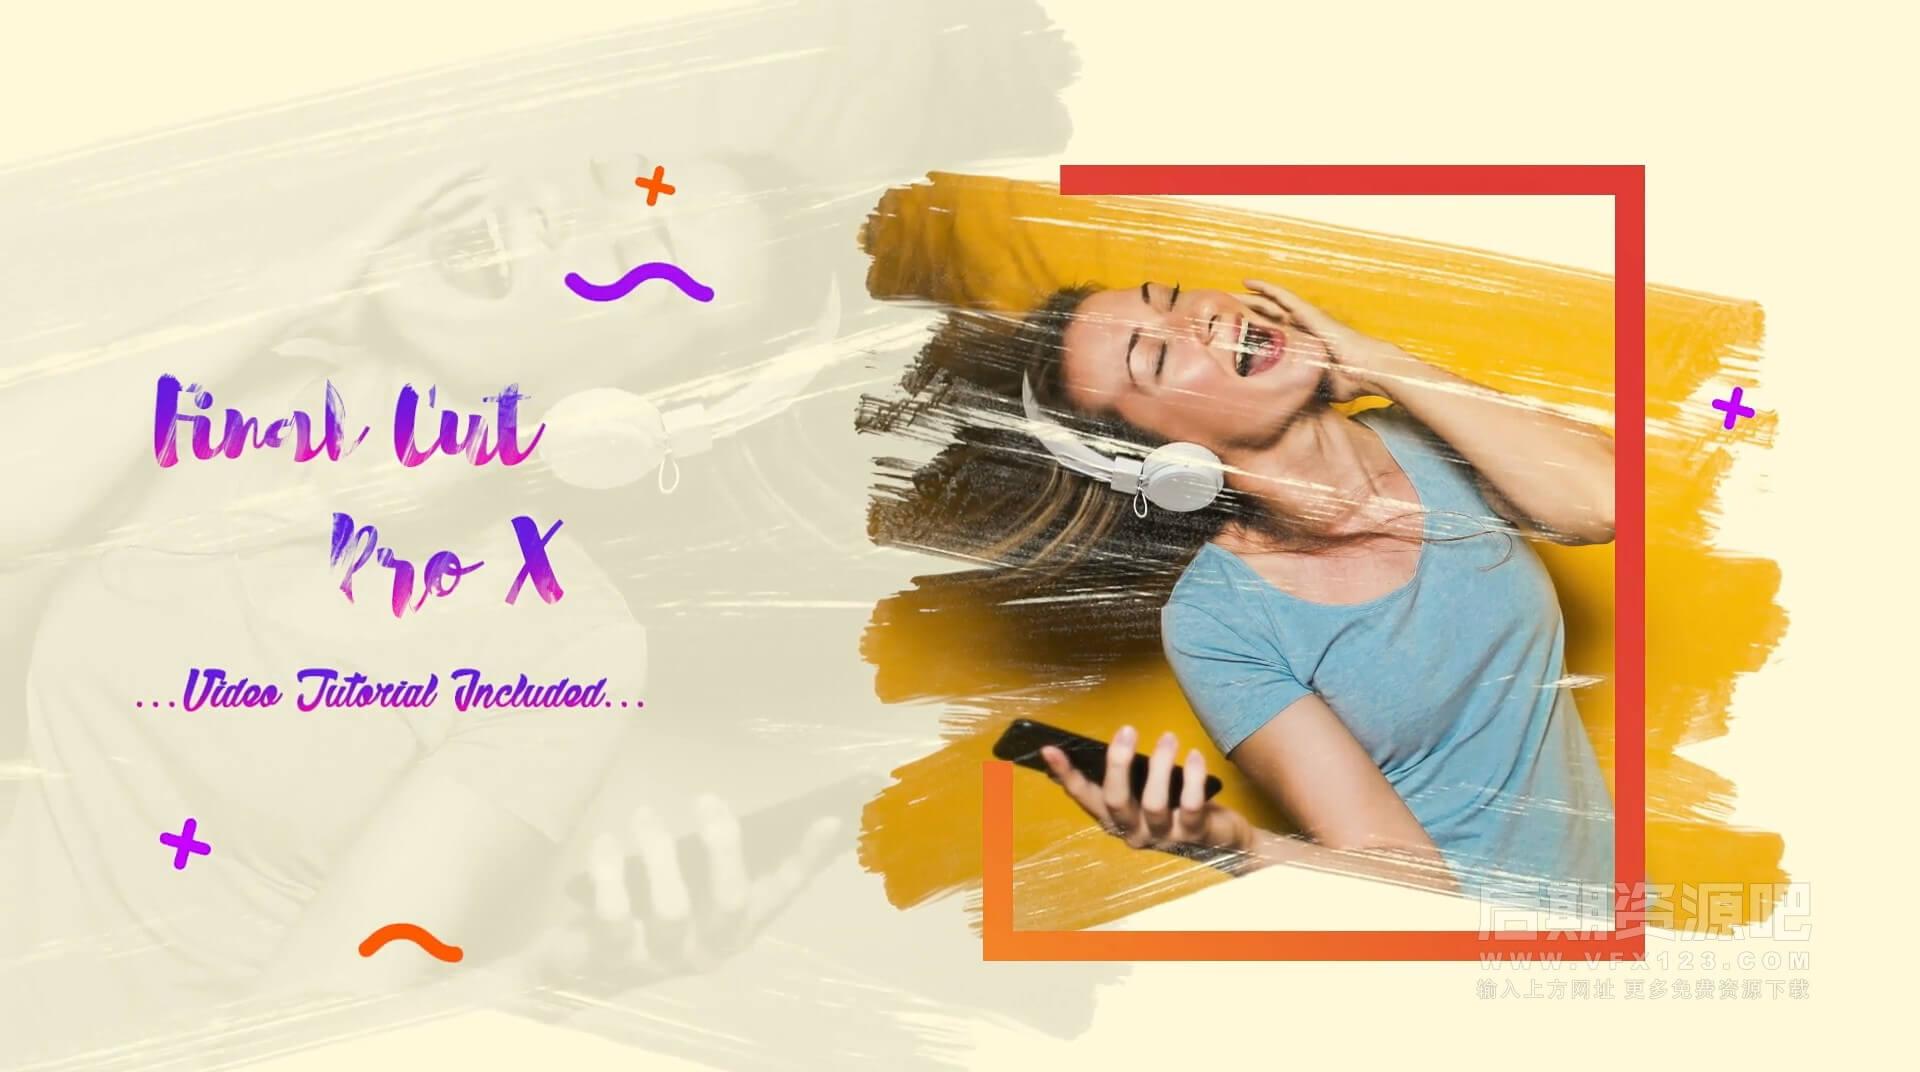 Fcpx主题模板 优雅清新夏日旅行快乐假期相册展示模板 Summer Slideshow